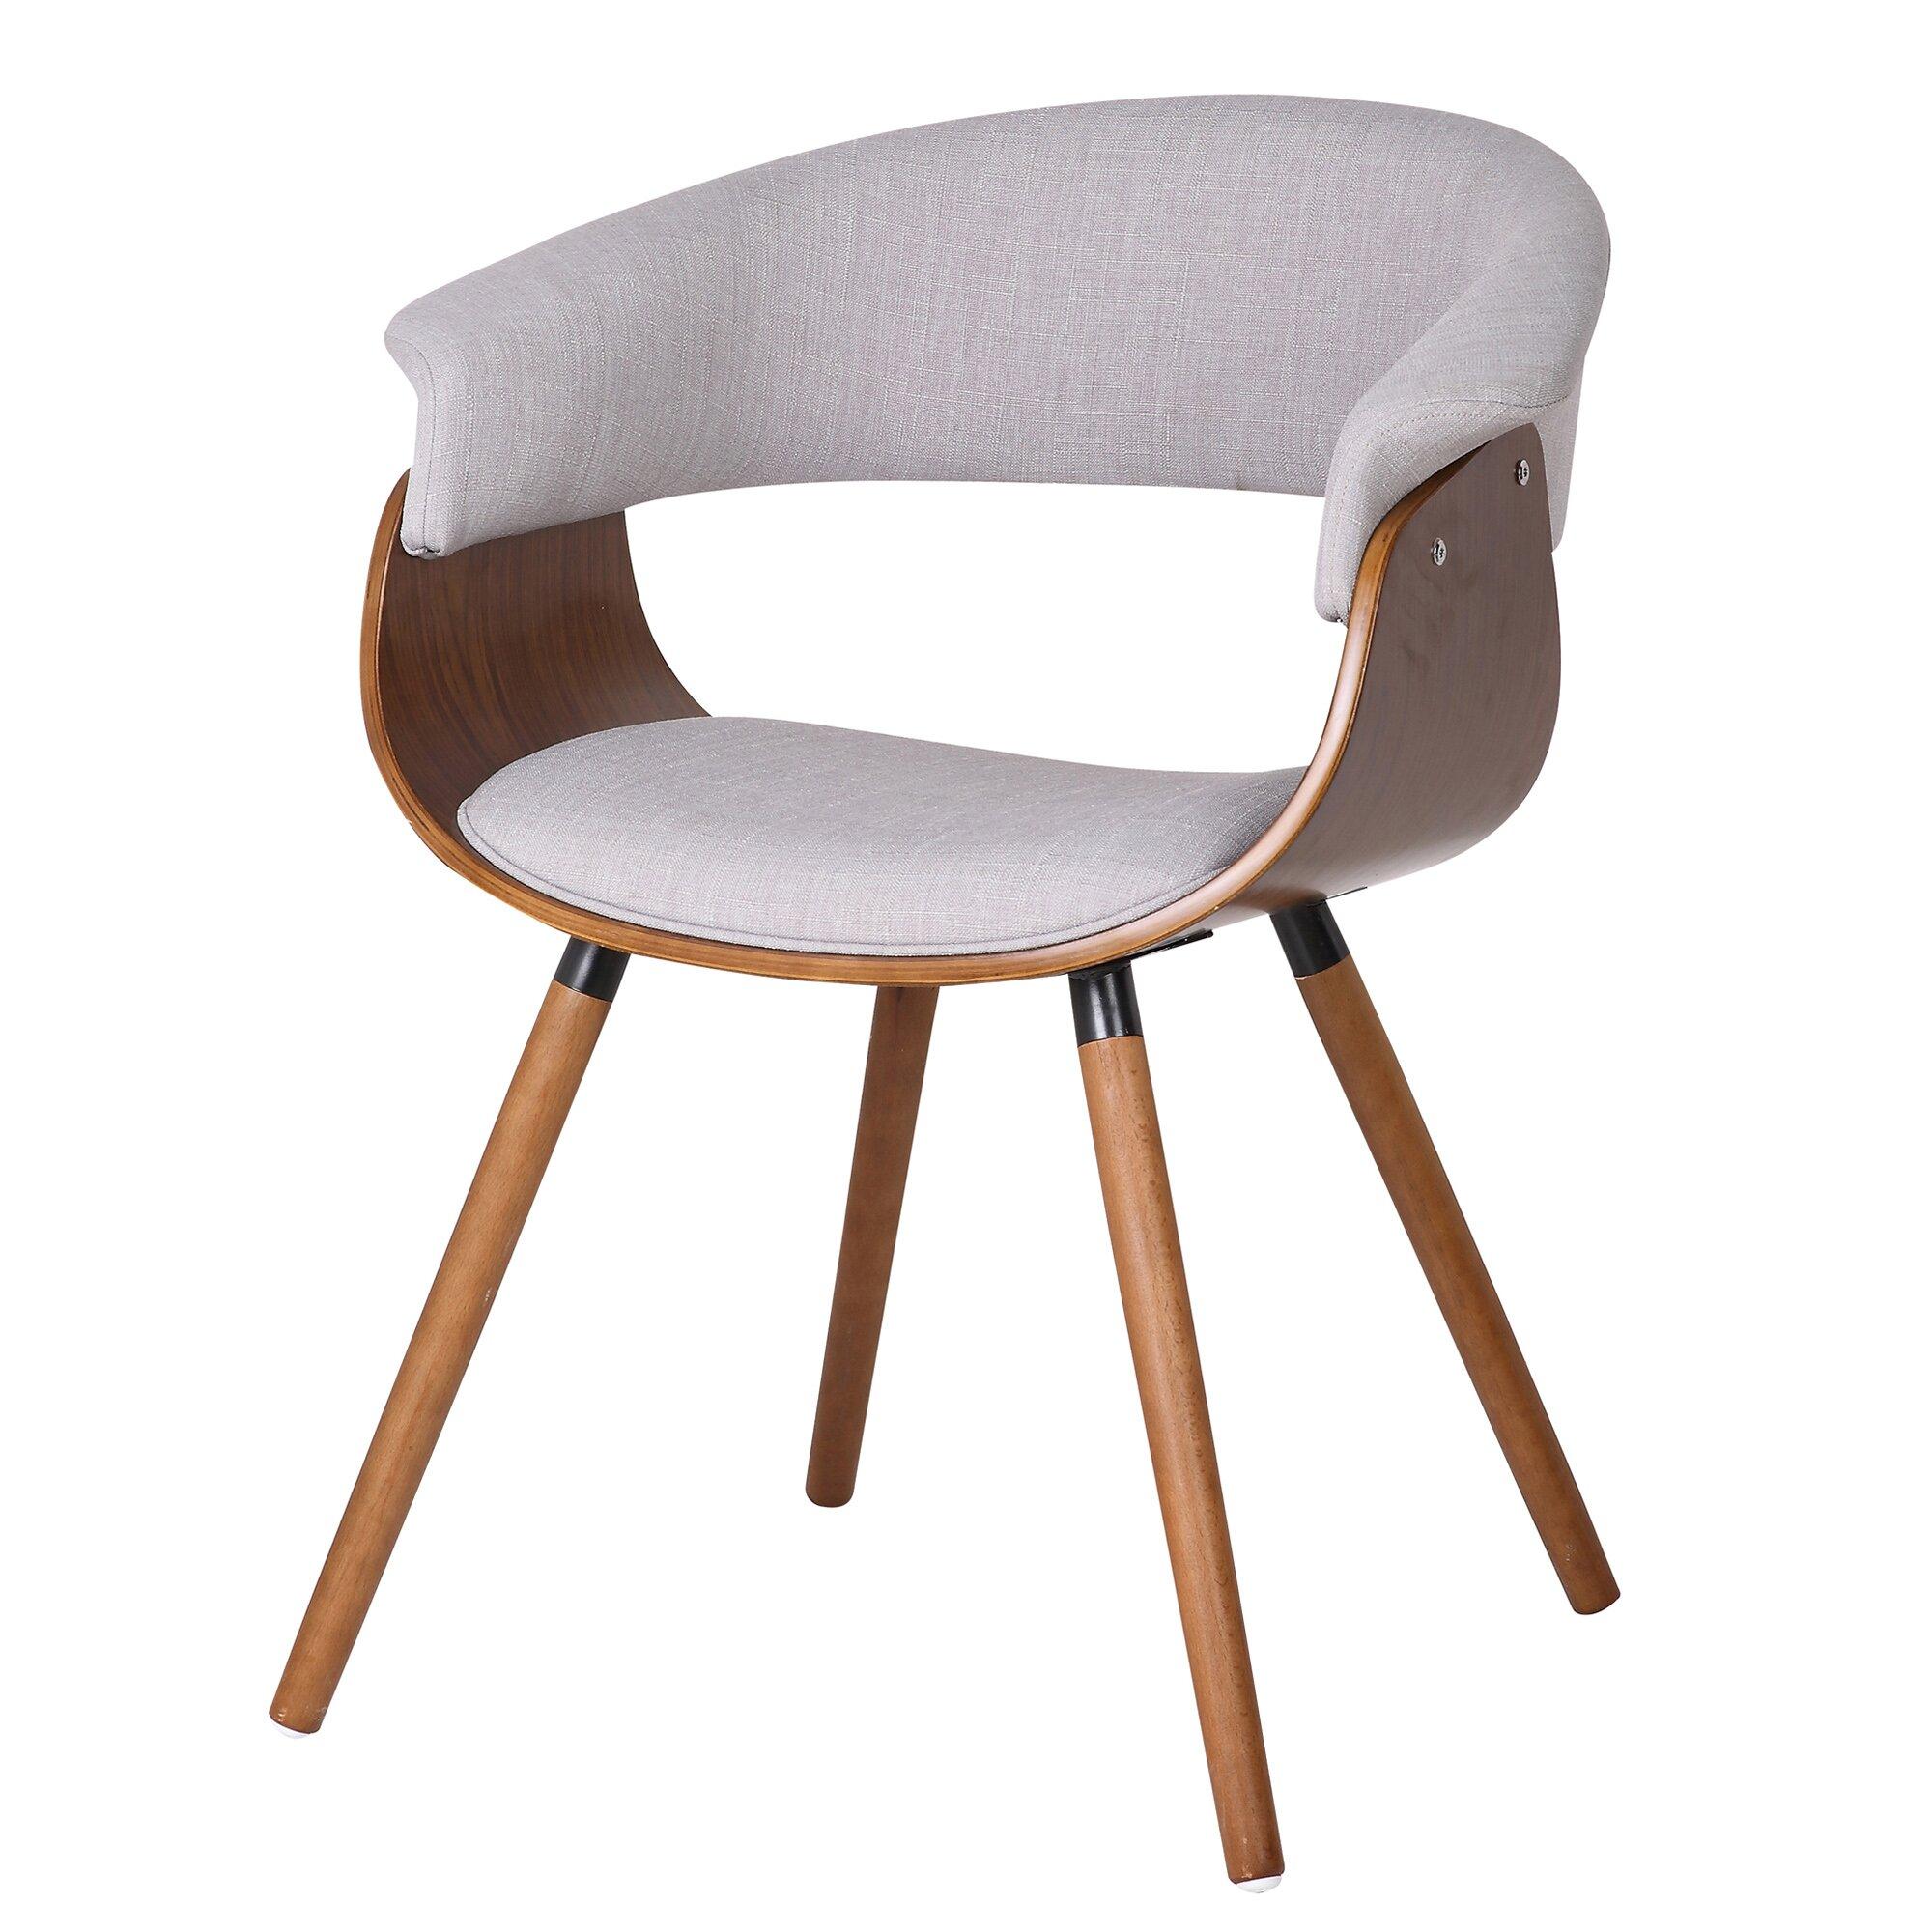 Walnut Dining Room Set Nspire Bent Wood Accent Barrel Chair Amp Reviews Wayfair